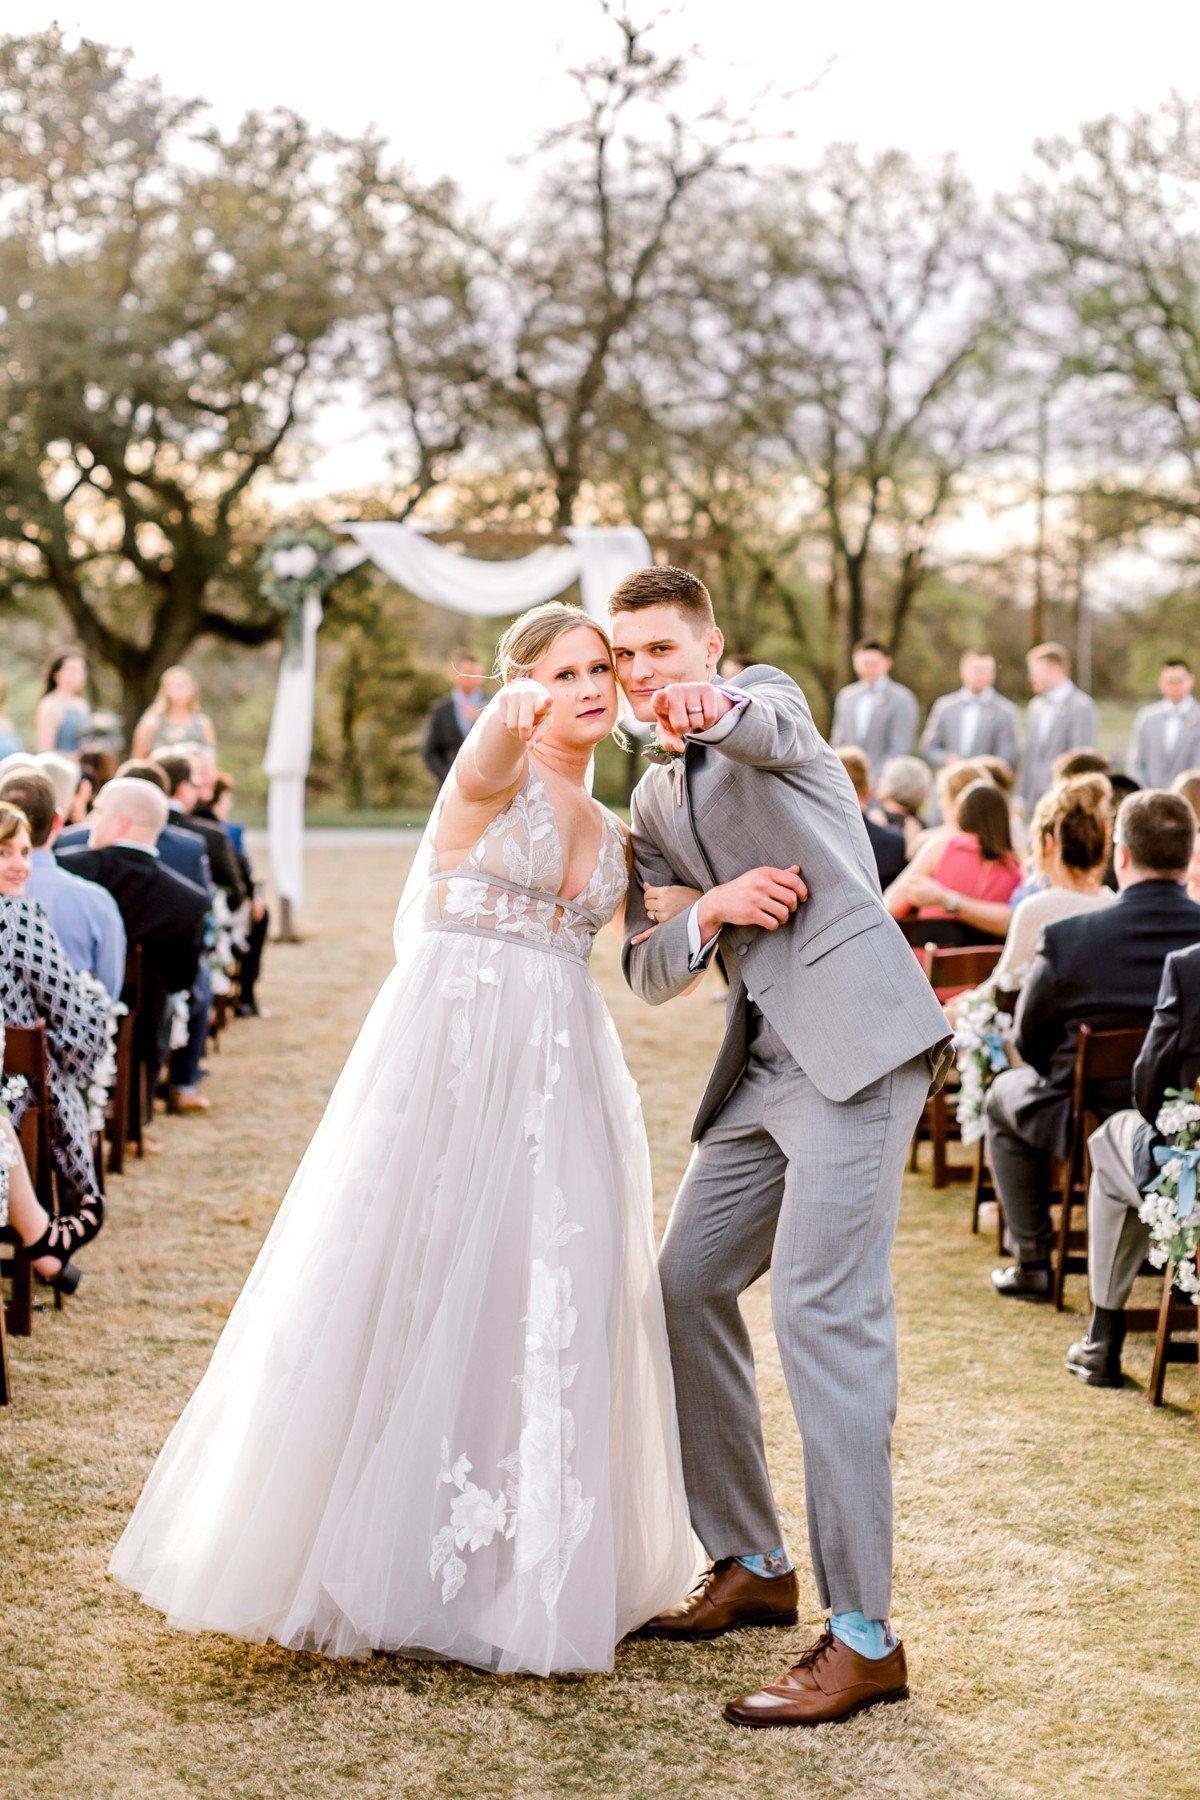 ennis-texas-wedding-photographer-kaitlyn-bullard-79.jpg